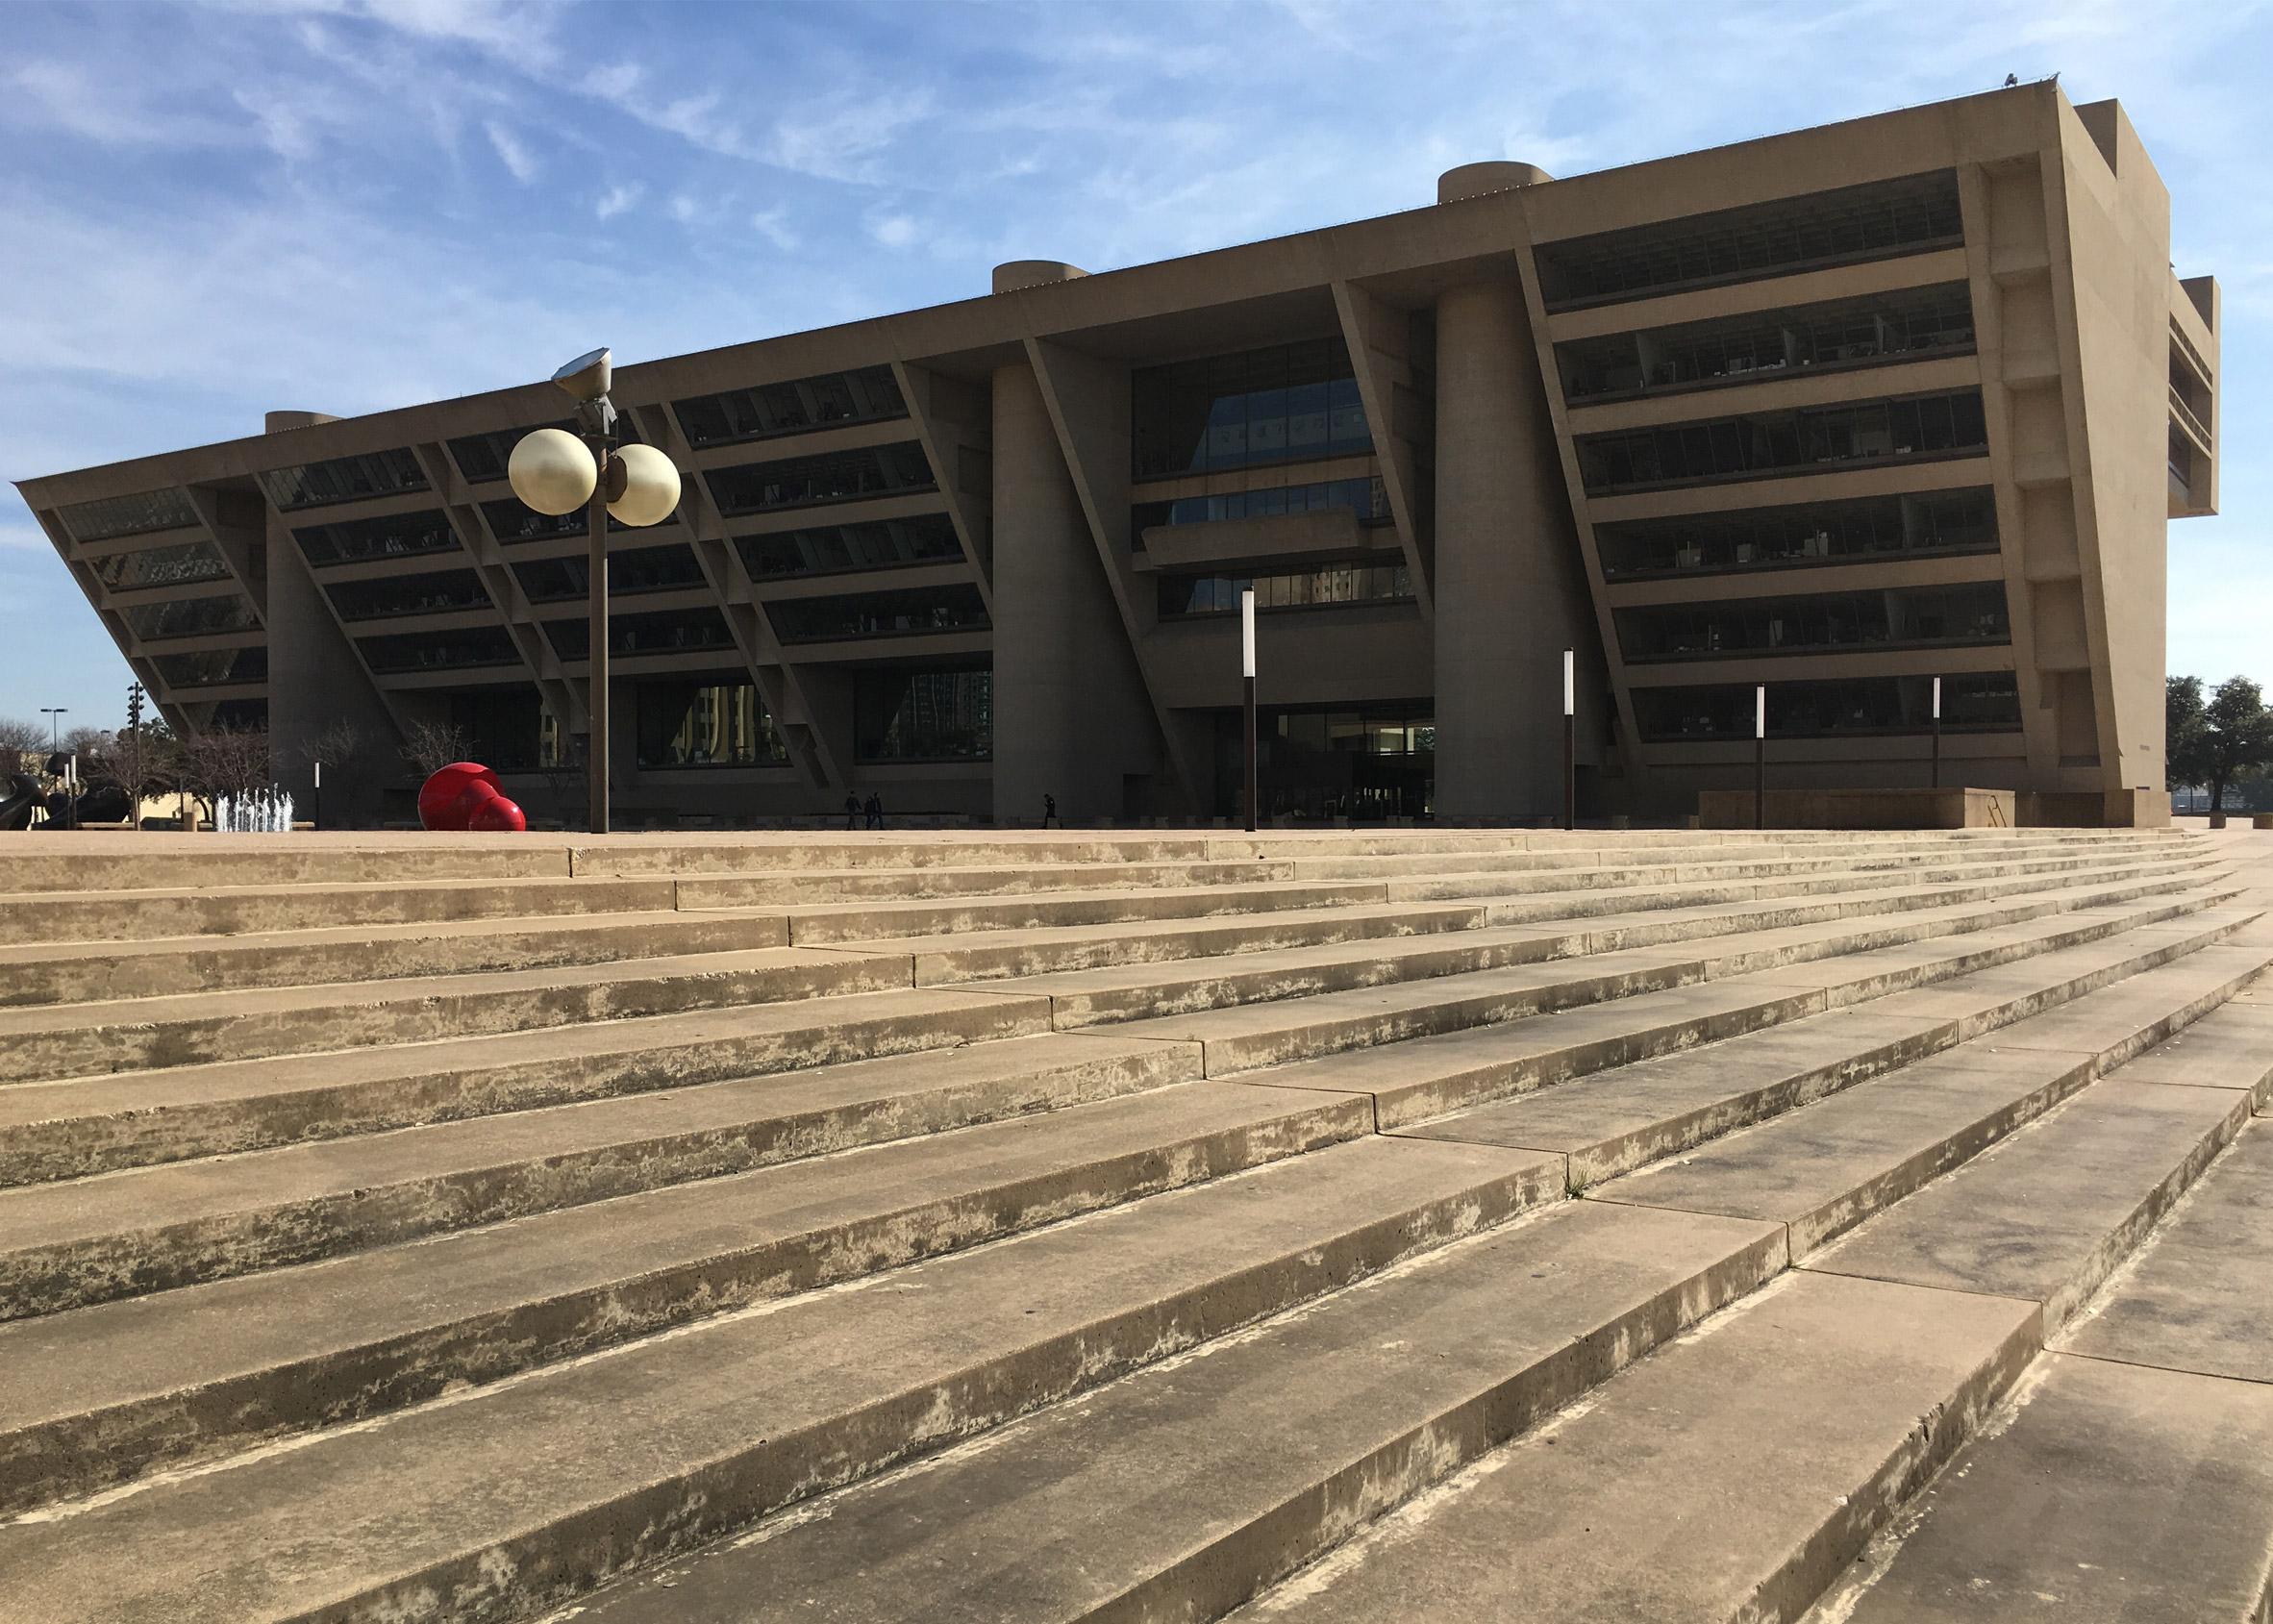 Dallas City Hall by I.M. Pei